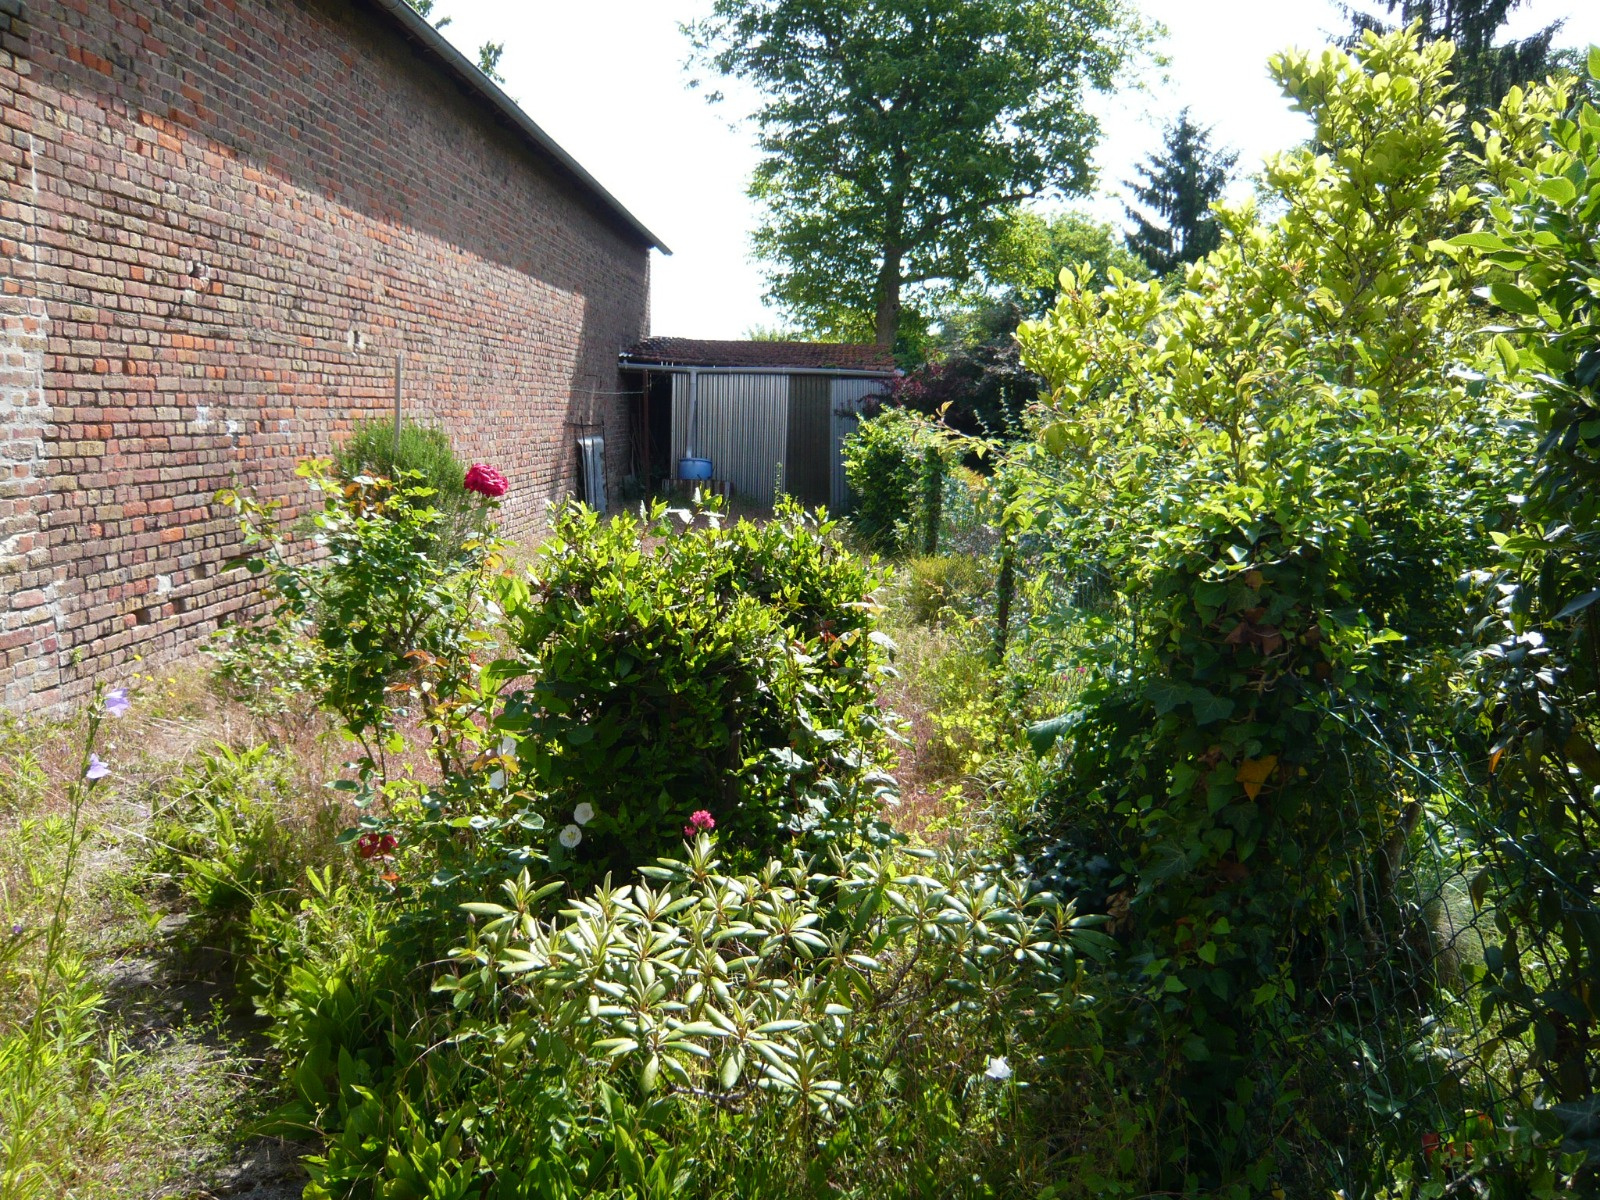 vente rivery amienoise avec jardin. Black Bedroom Furniture Sets. Home Design Ideas